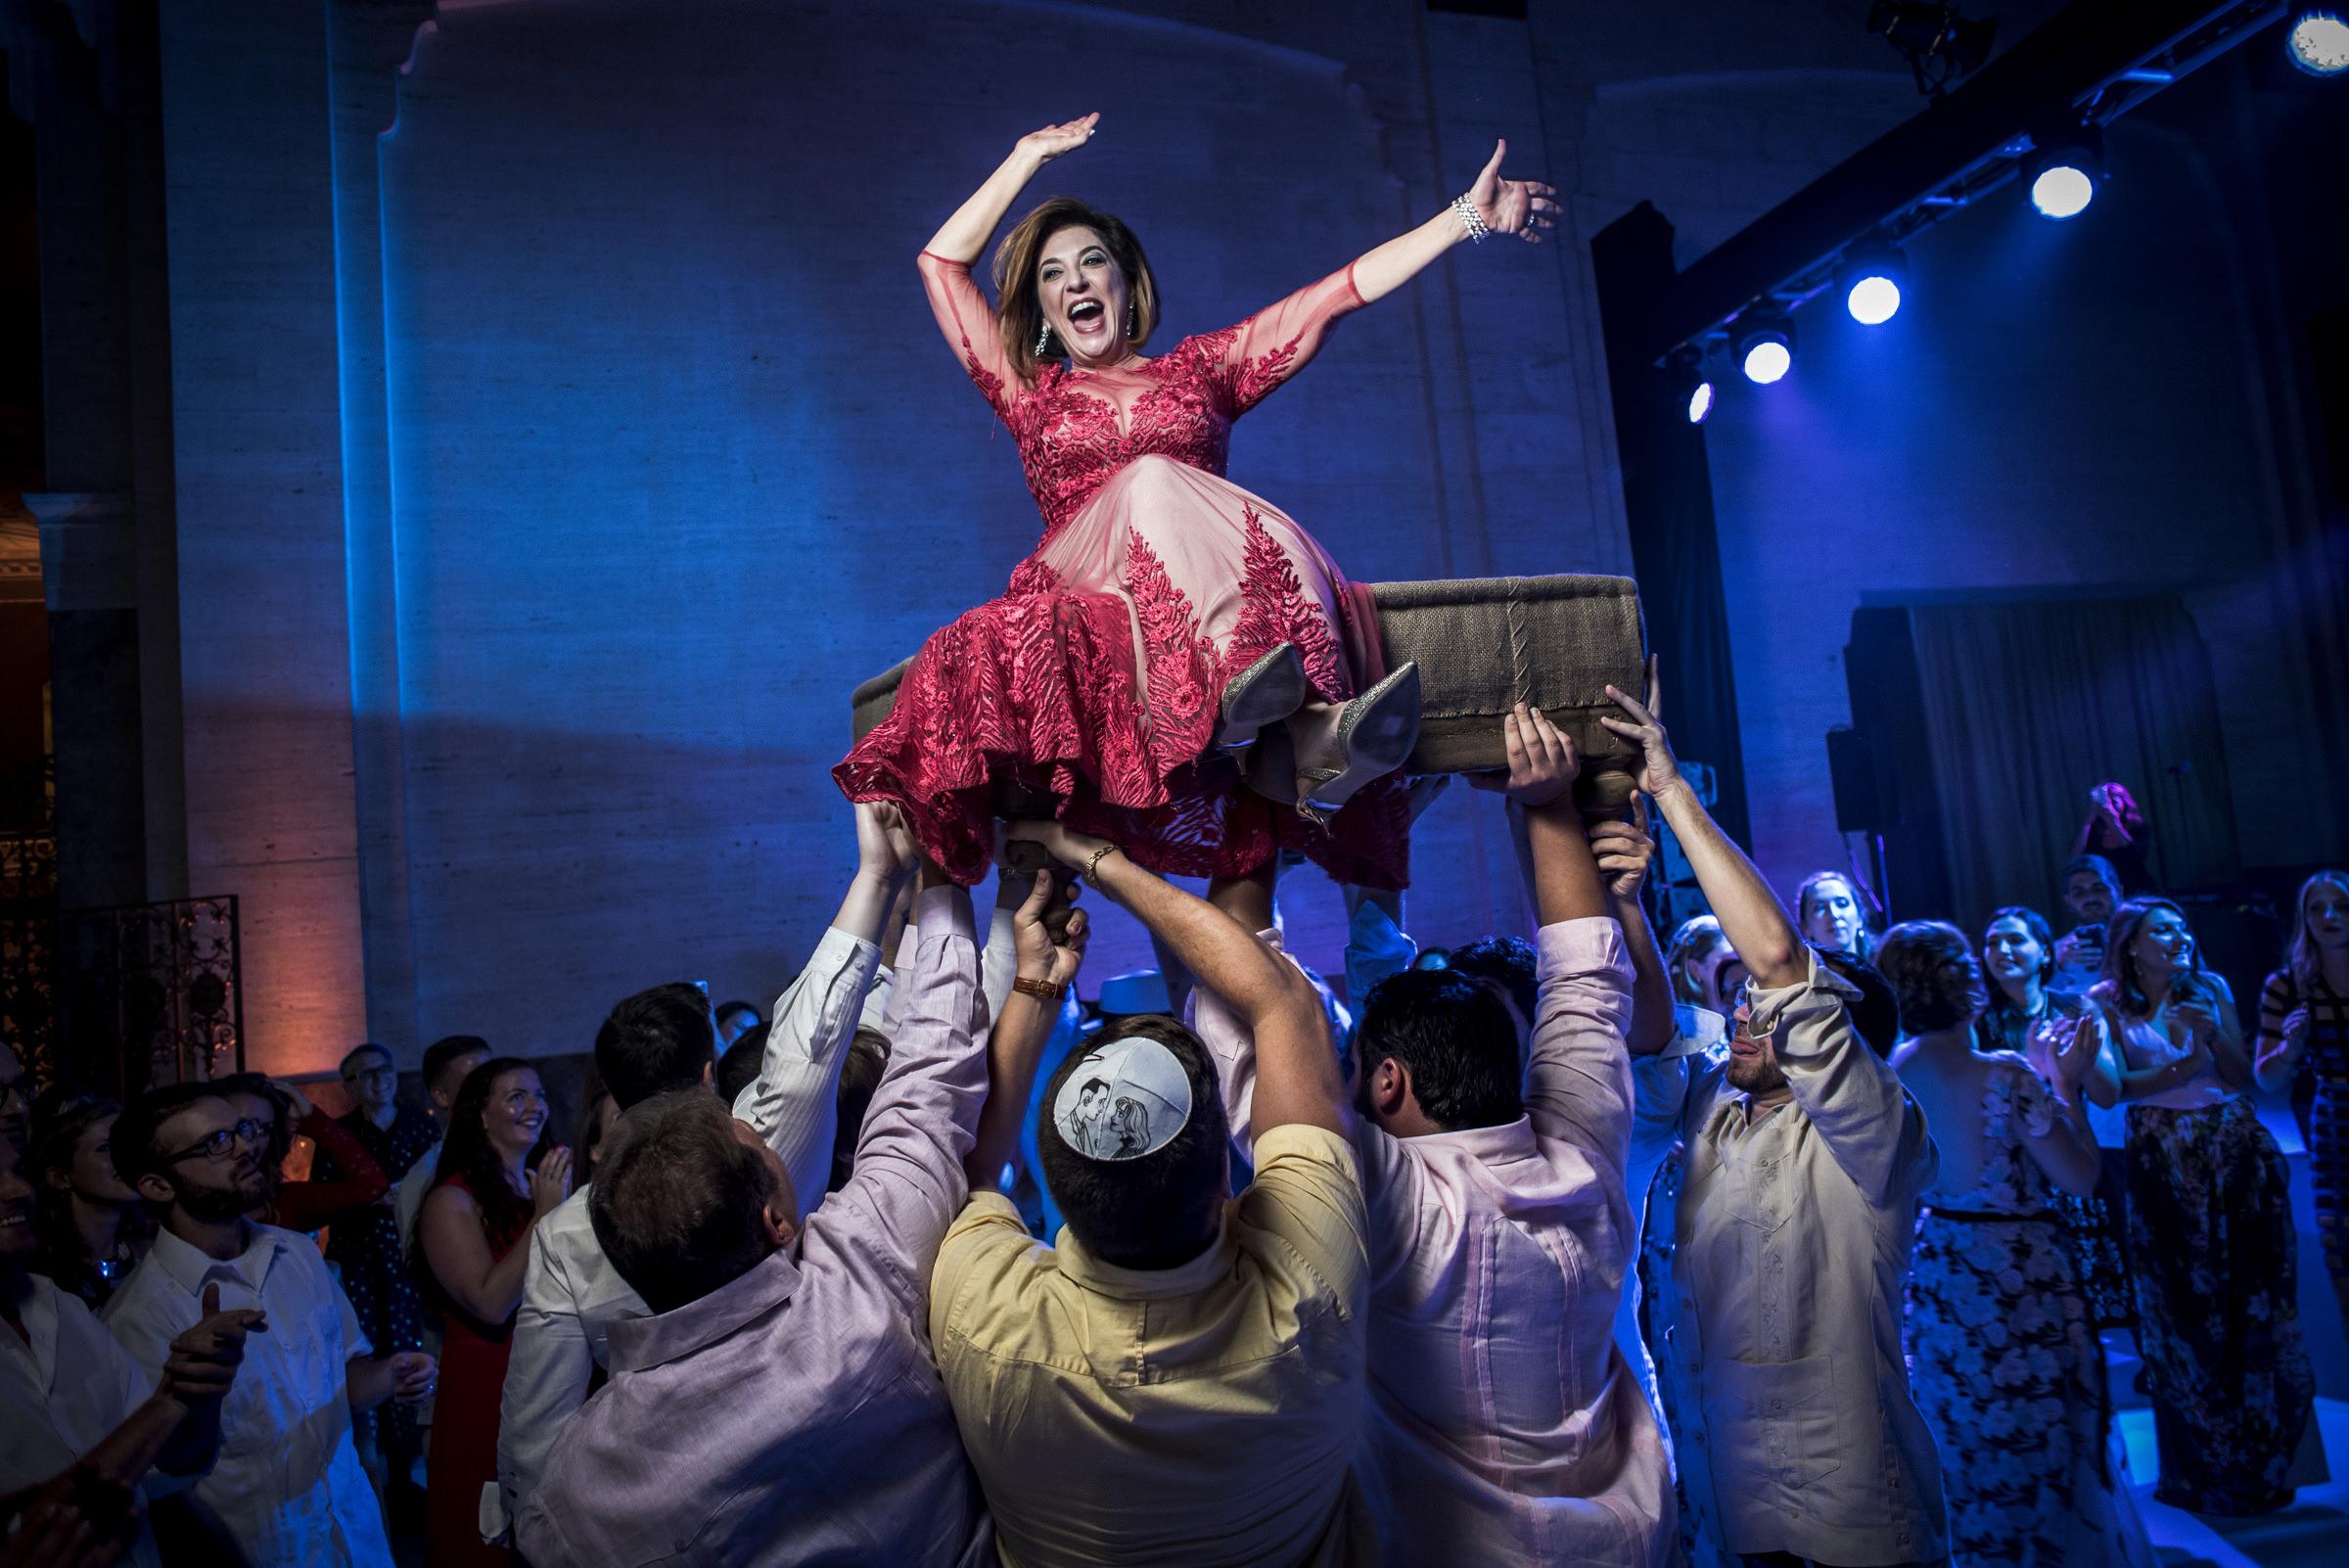 Estatic mother celebrates during Hora Dance - photo by El Marco Rojo